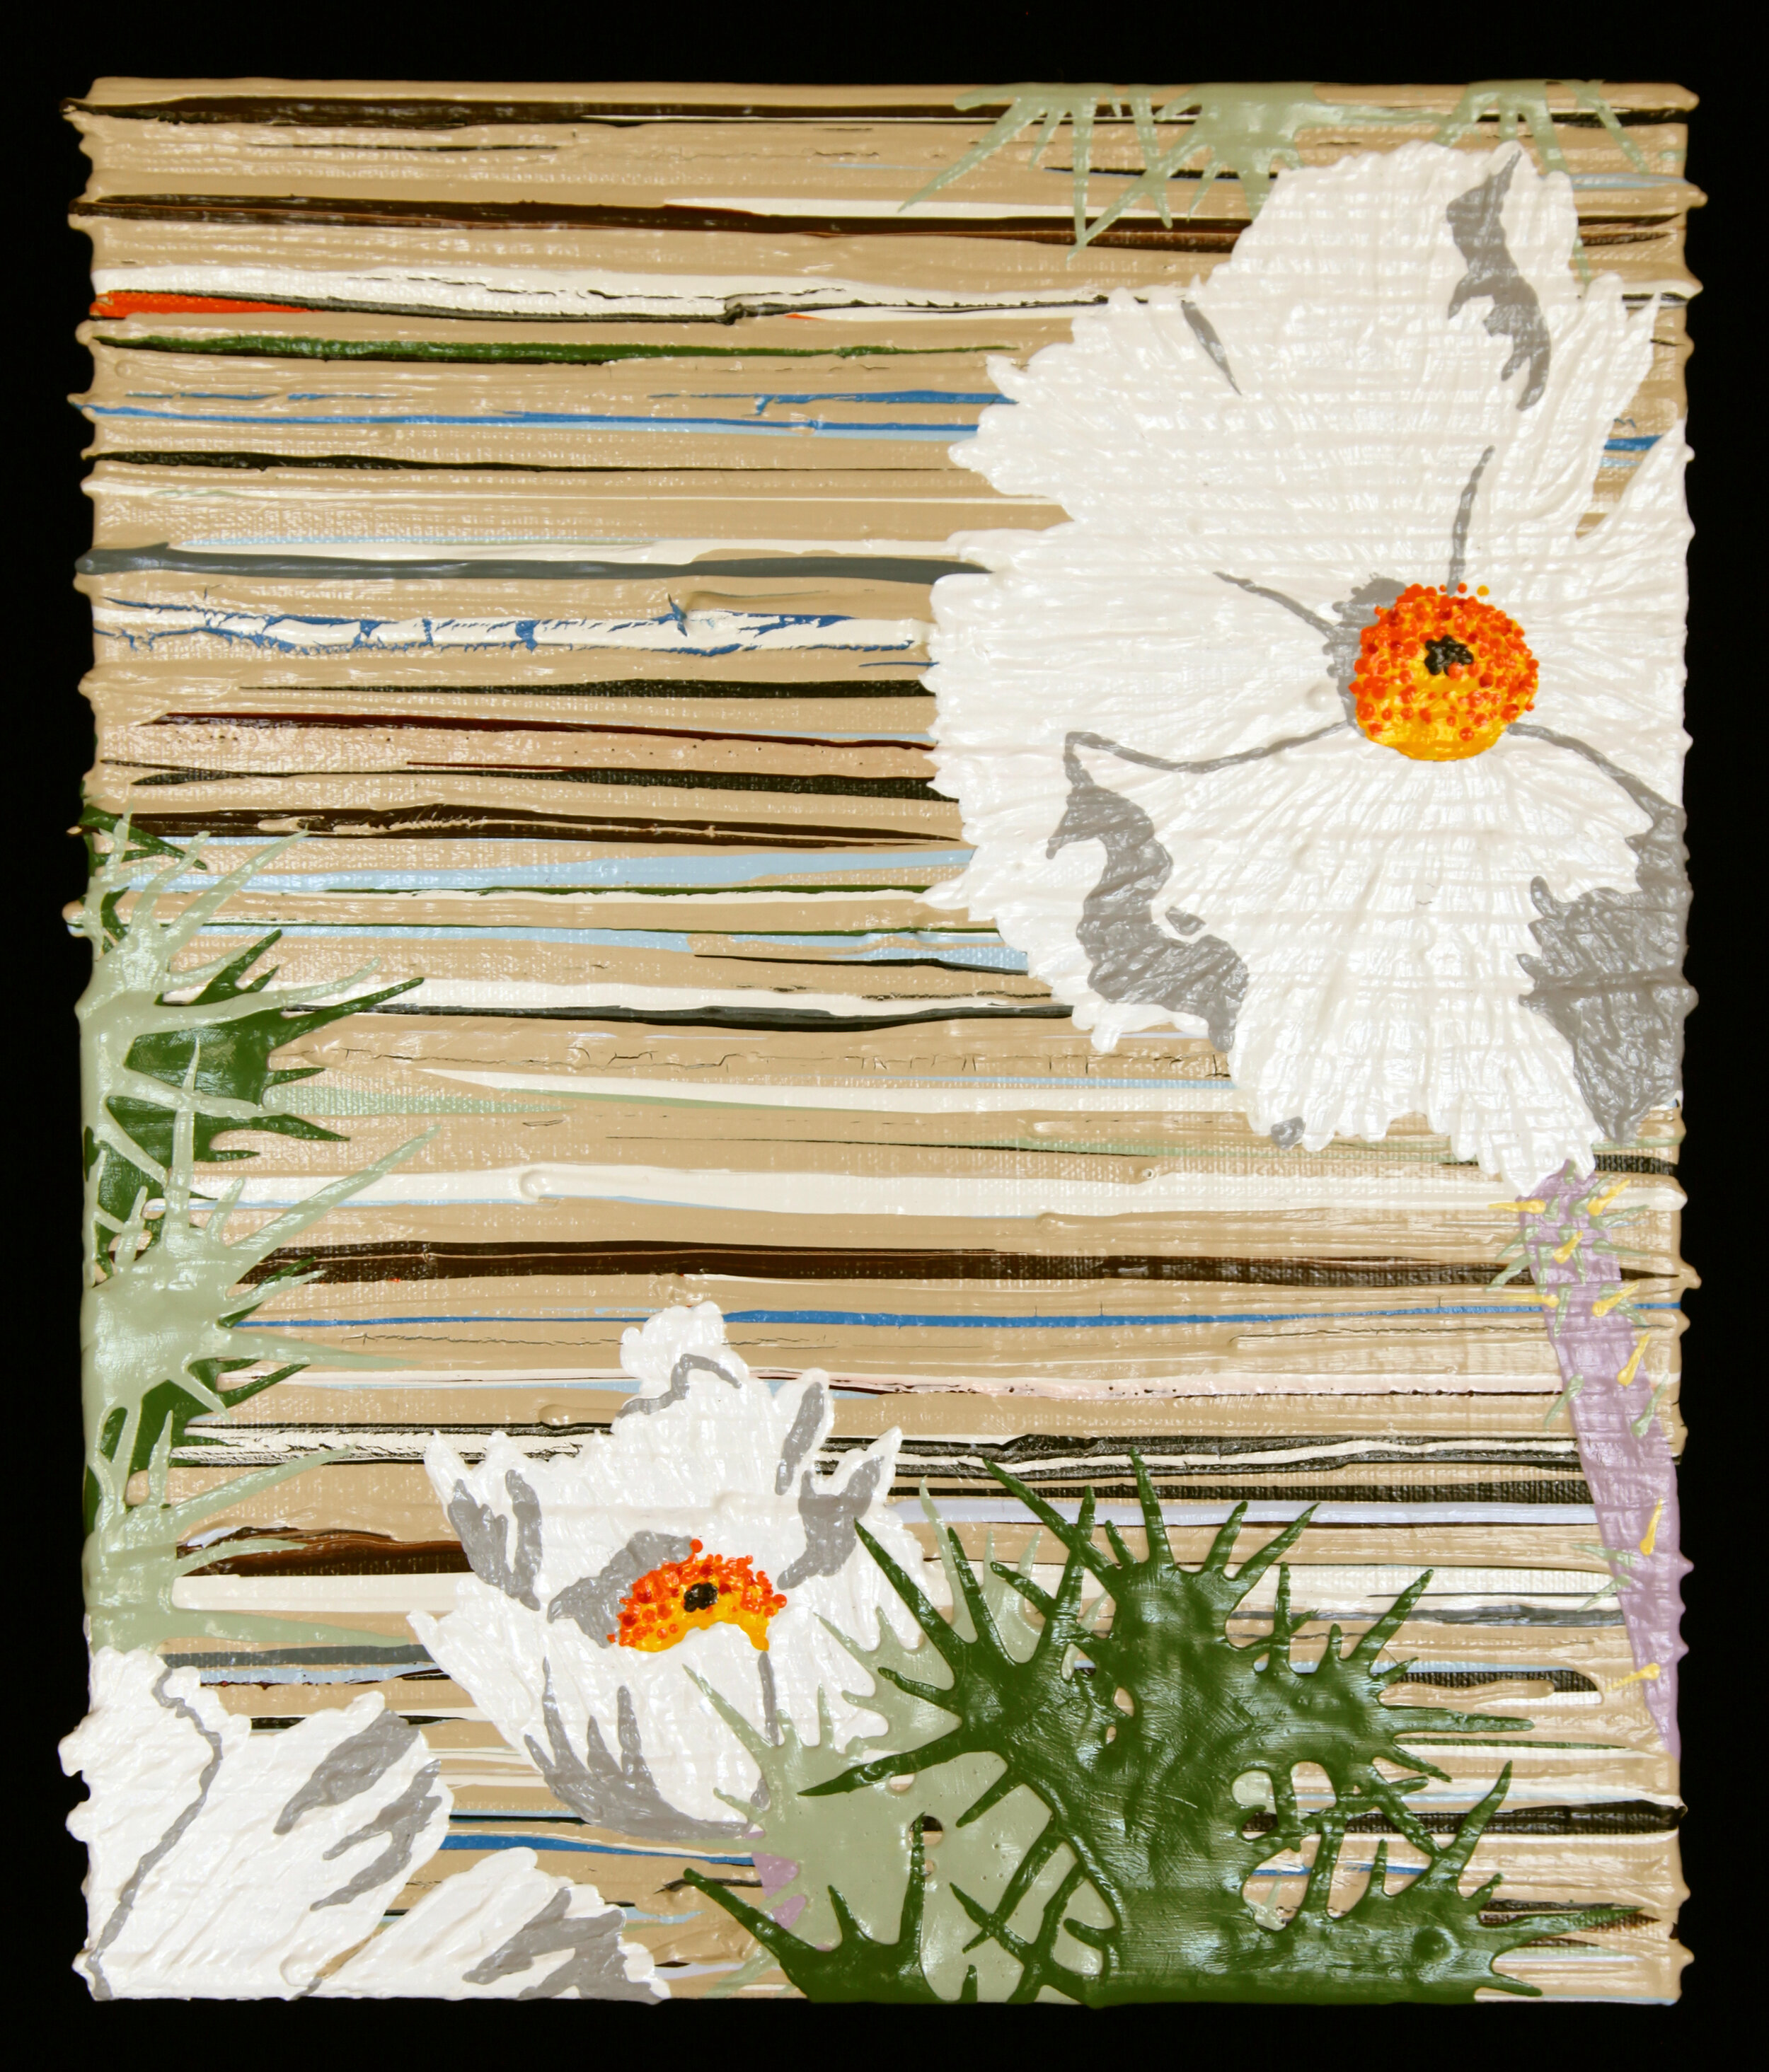 Nevada Humanities/Jeff Fulmer. Prickly Poppy